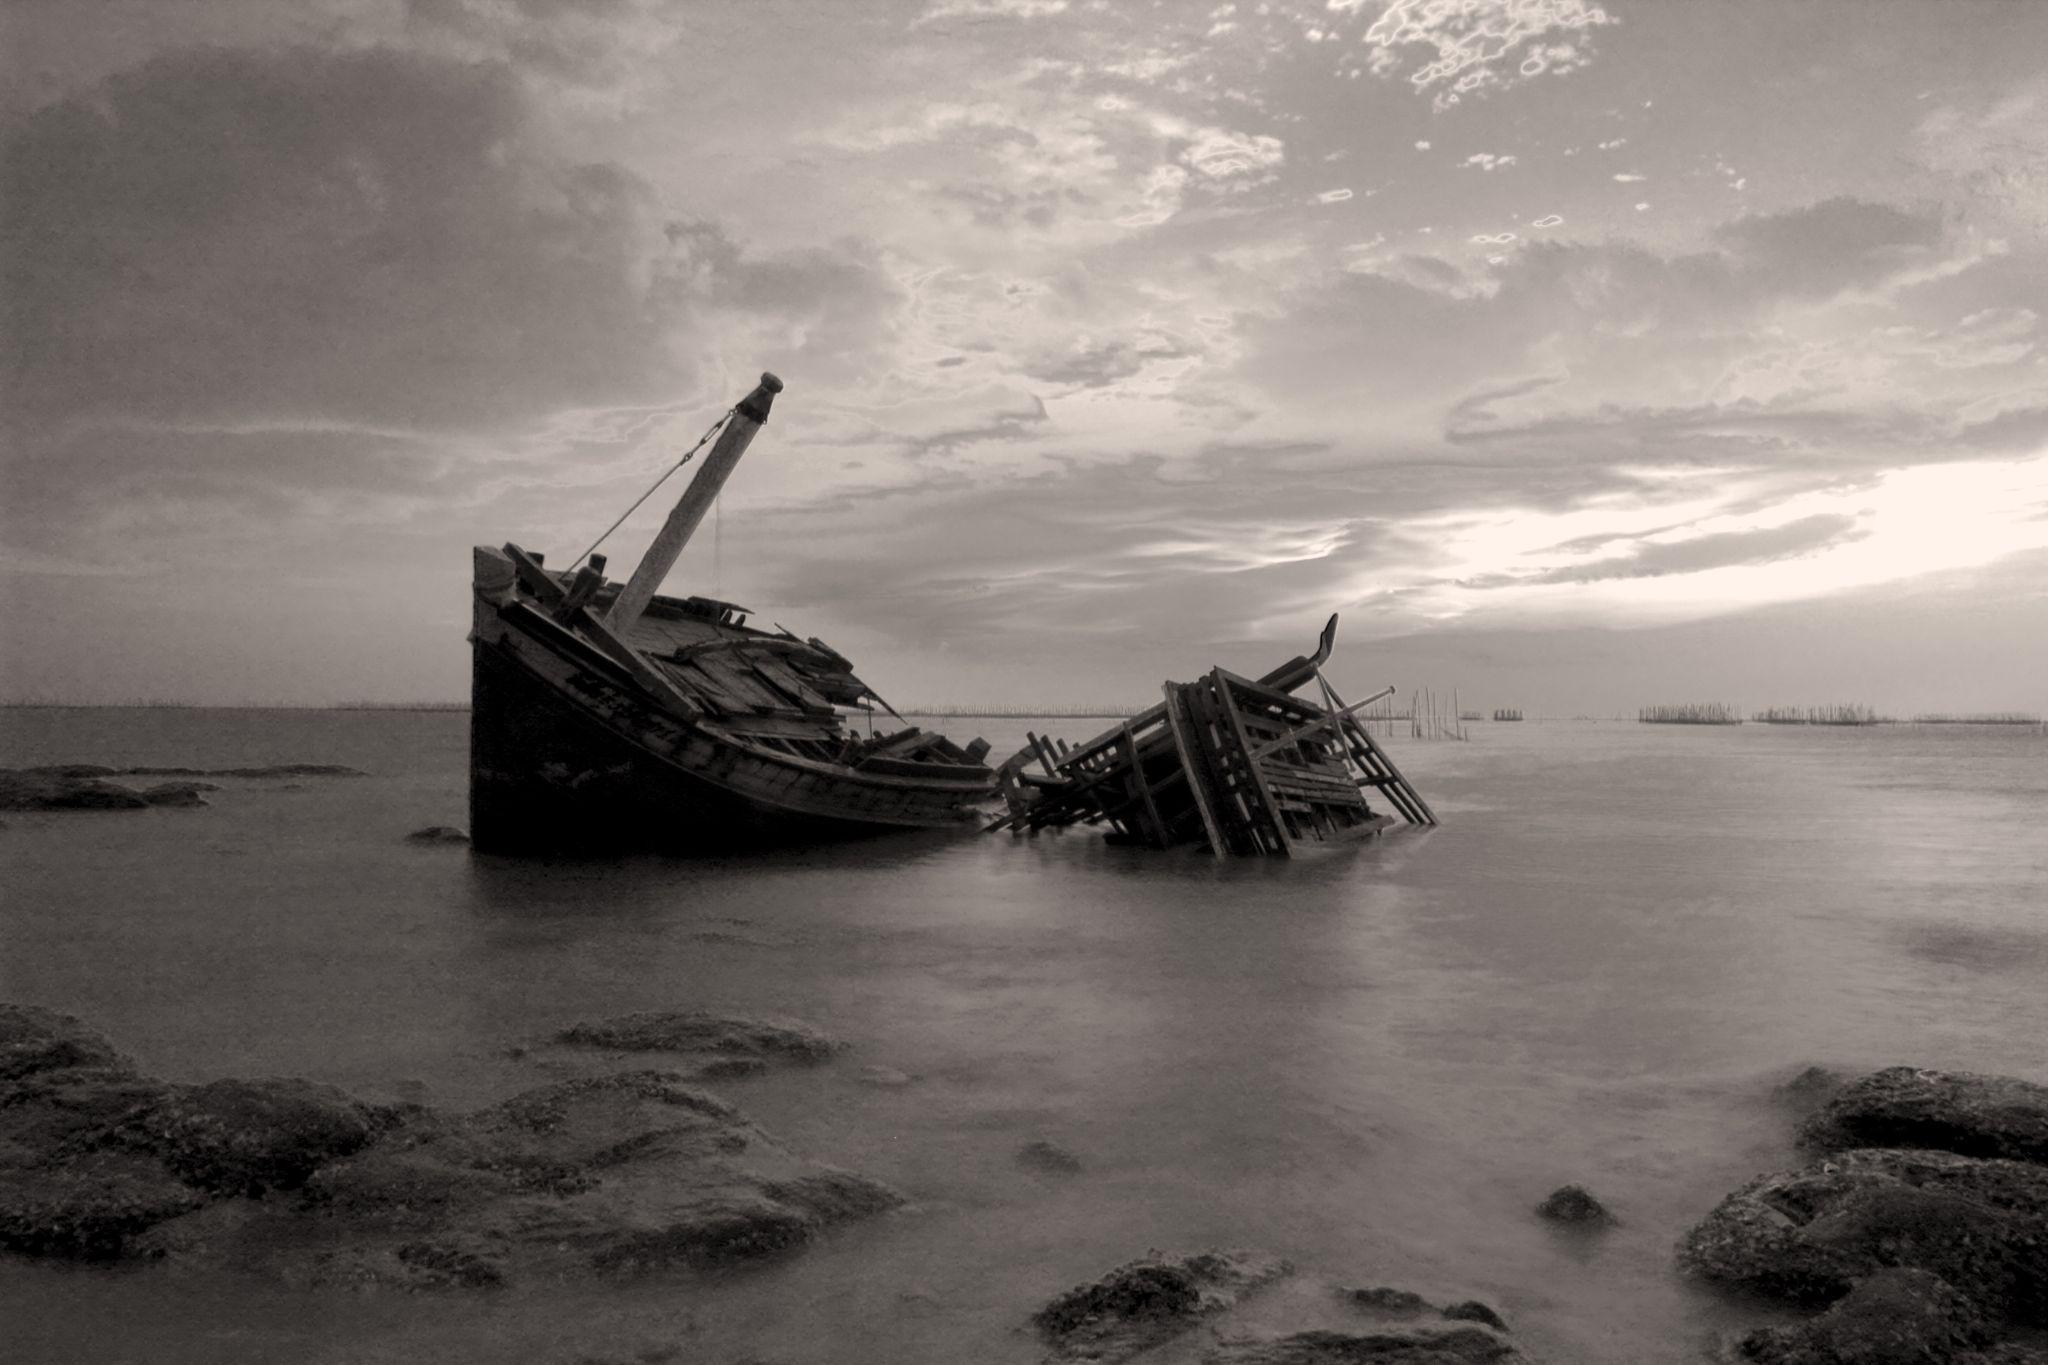 Shipwreck_1 by kittipatboonchim